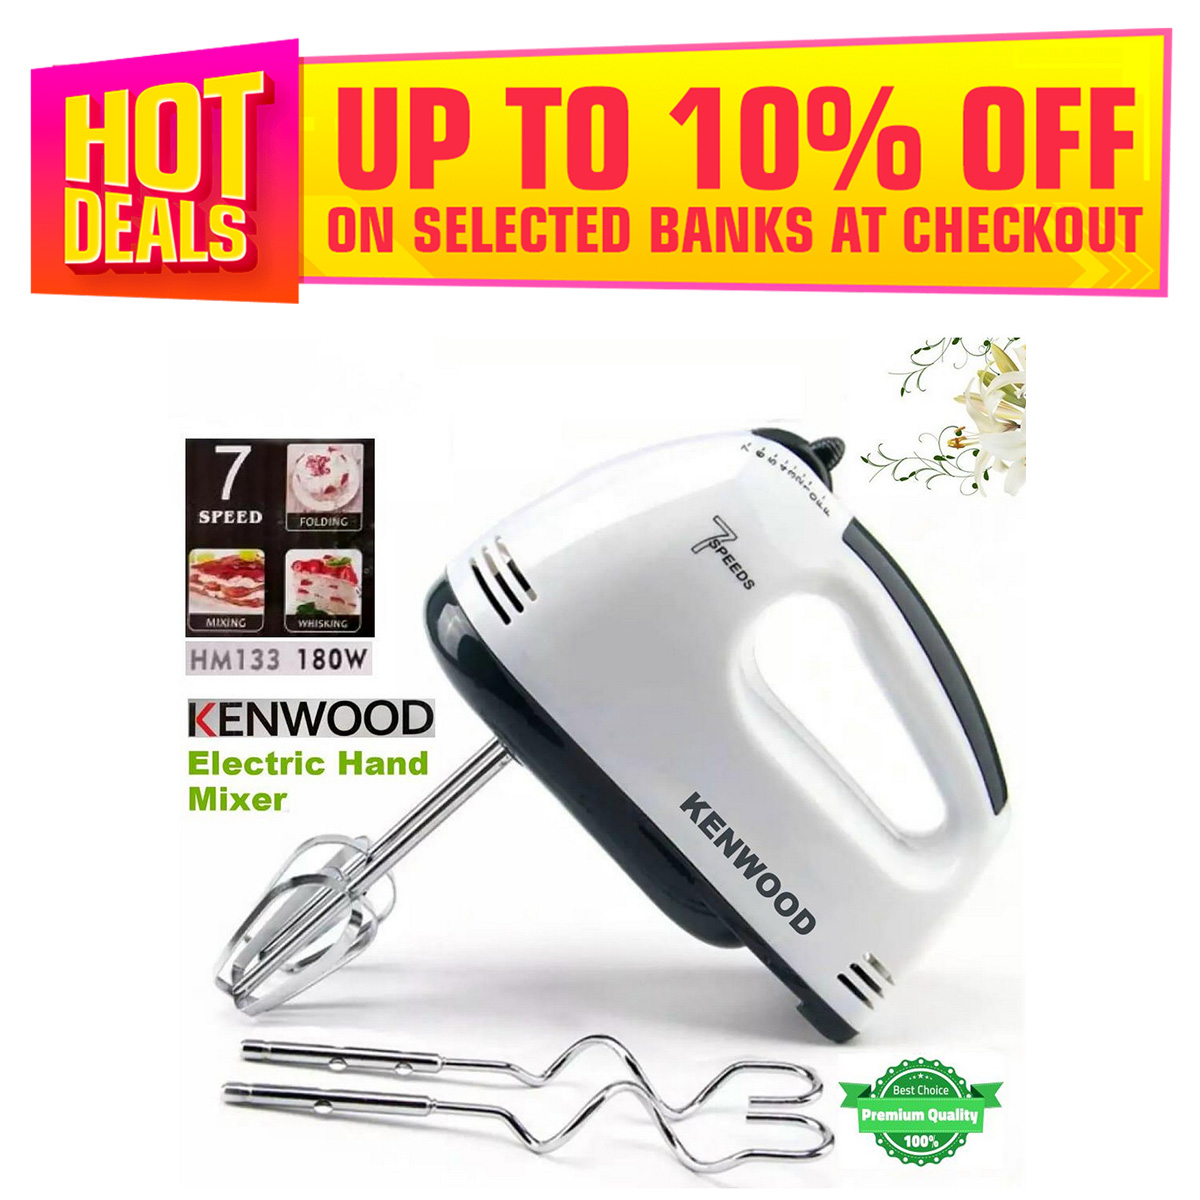 Kenwood Hm-133 Electric Food Mixer Handheld Egg Beater Blender, Electric Powered Hand Mixer Whisk Egg Beater Cake Baking Mains 7 Speed,